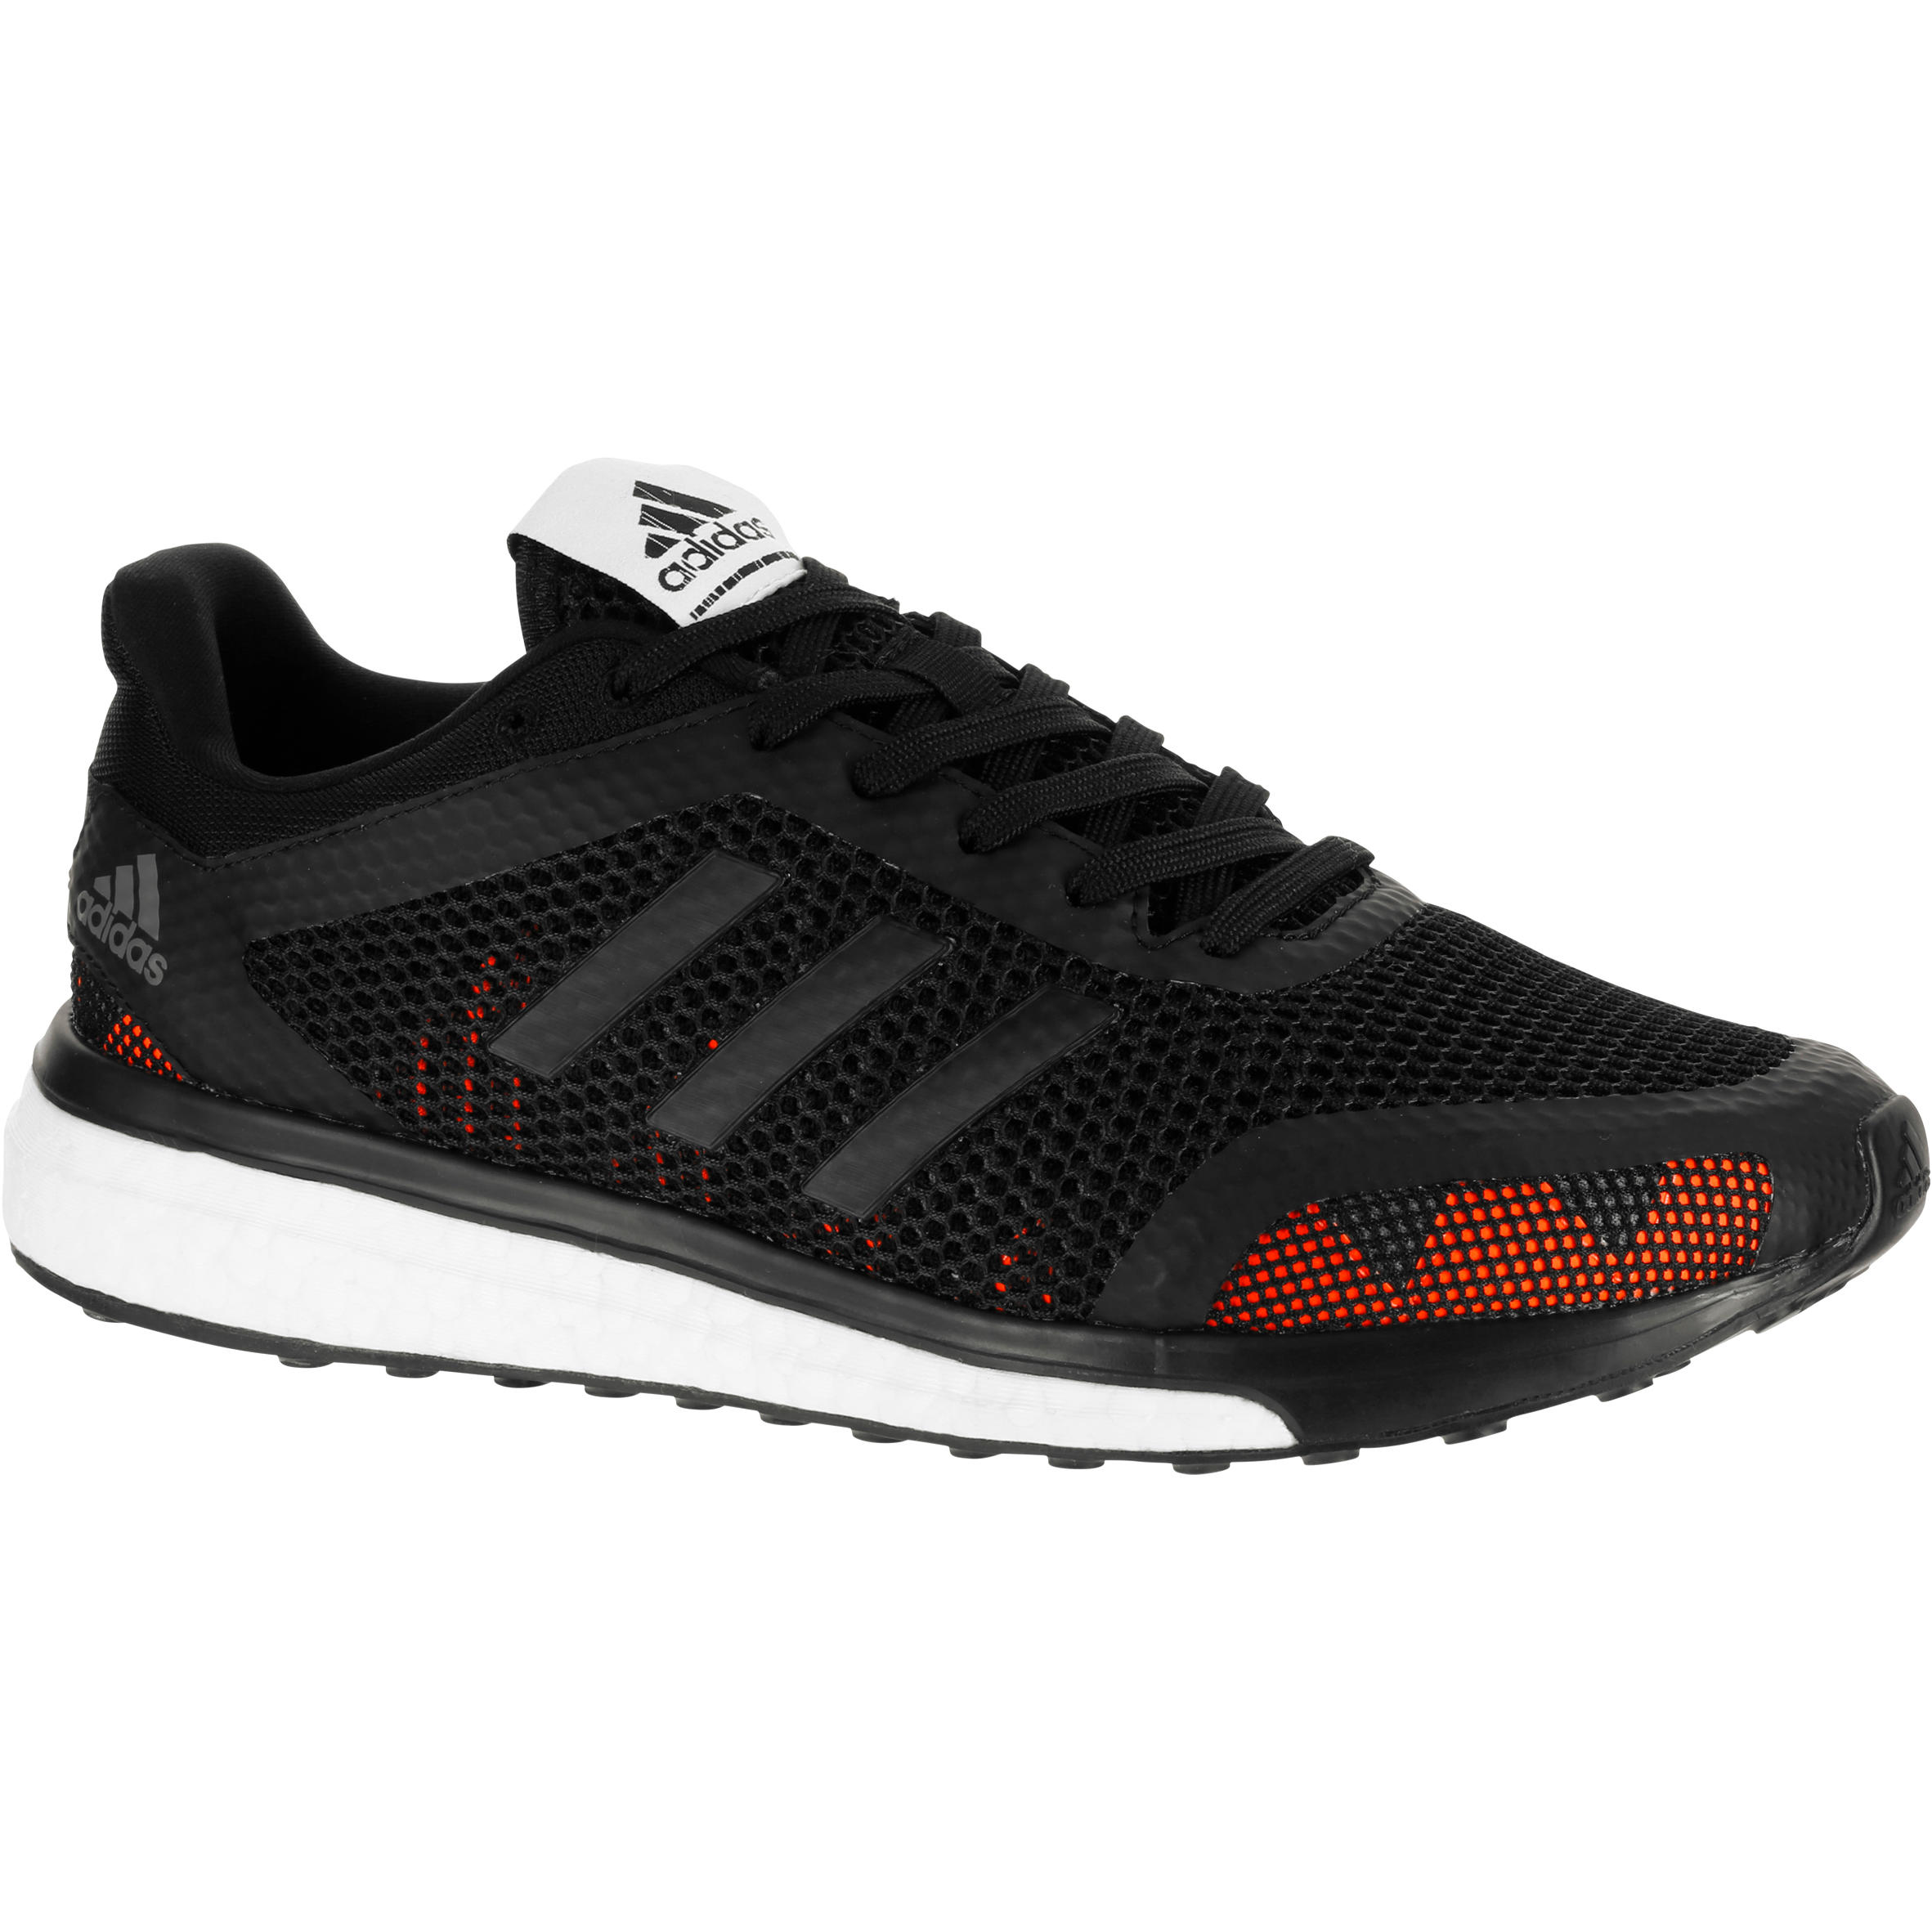 Noir Response Running Adidas Boost Homme Chaussures Plus kOuPXZiT